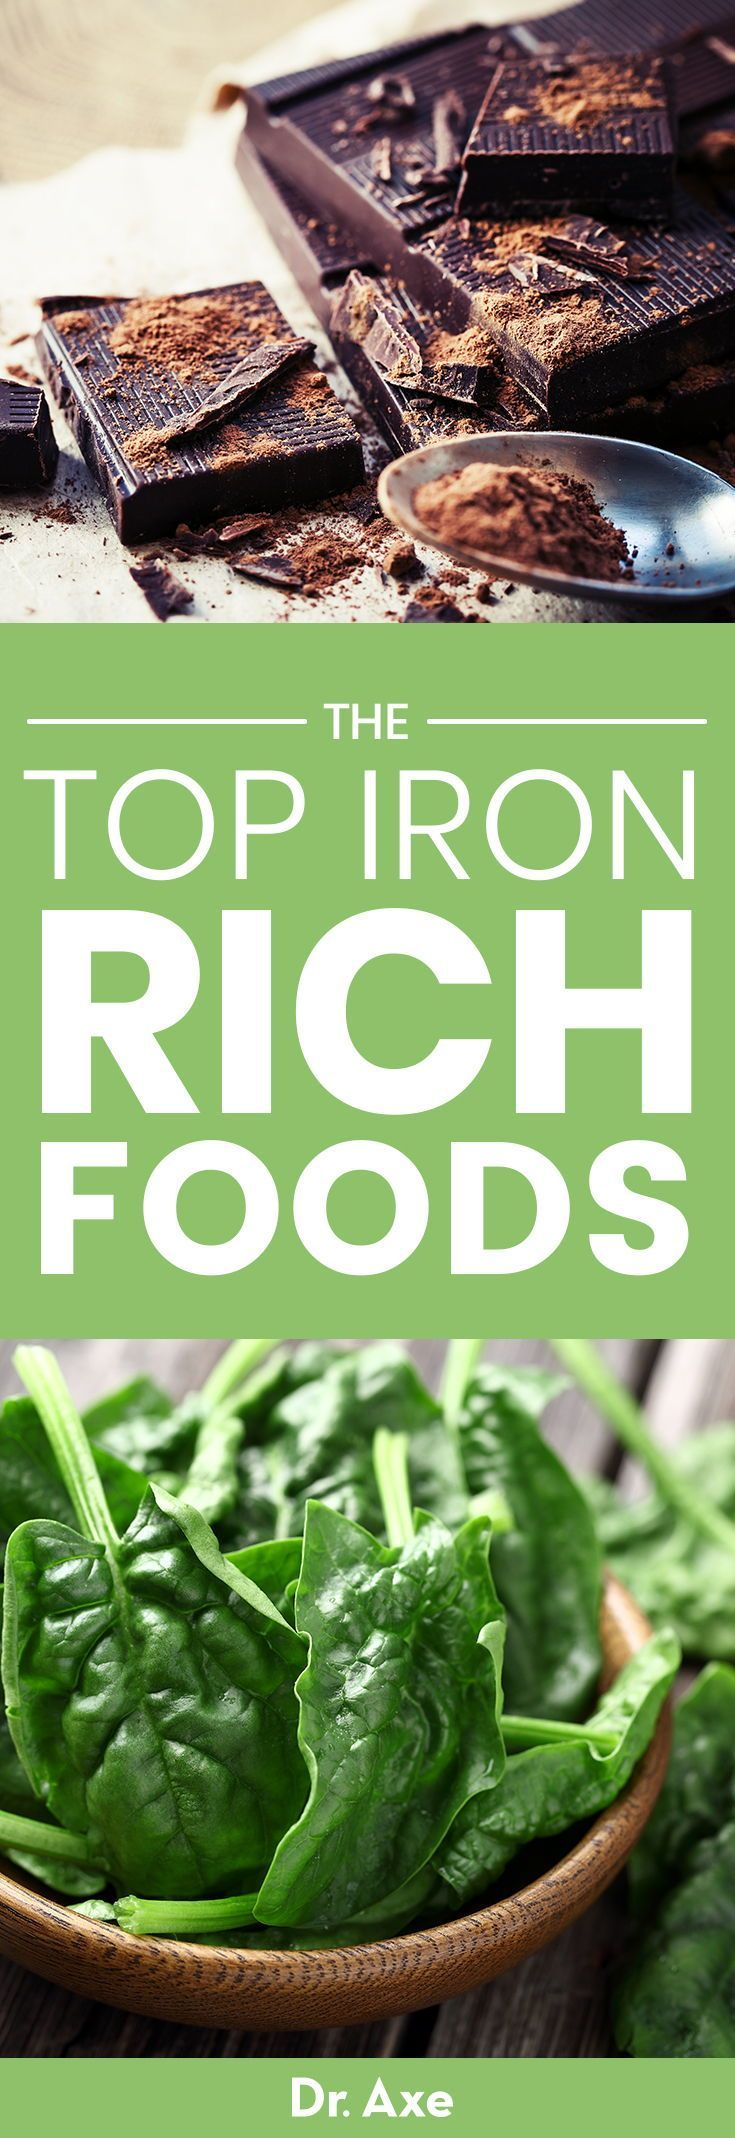 Top 15 IronRich Foods in 2020 Iron rich foods, Food